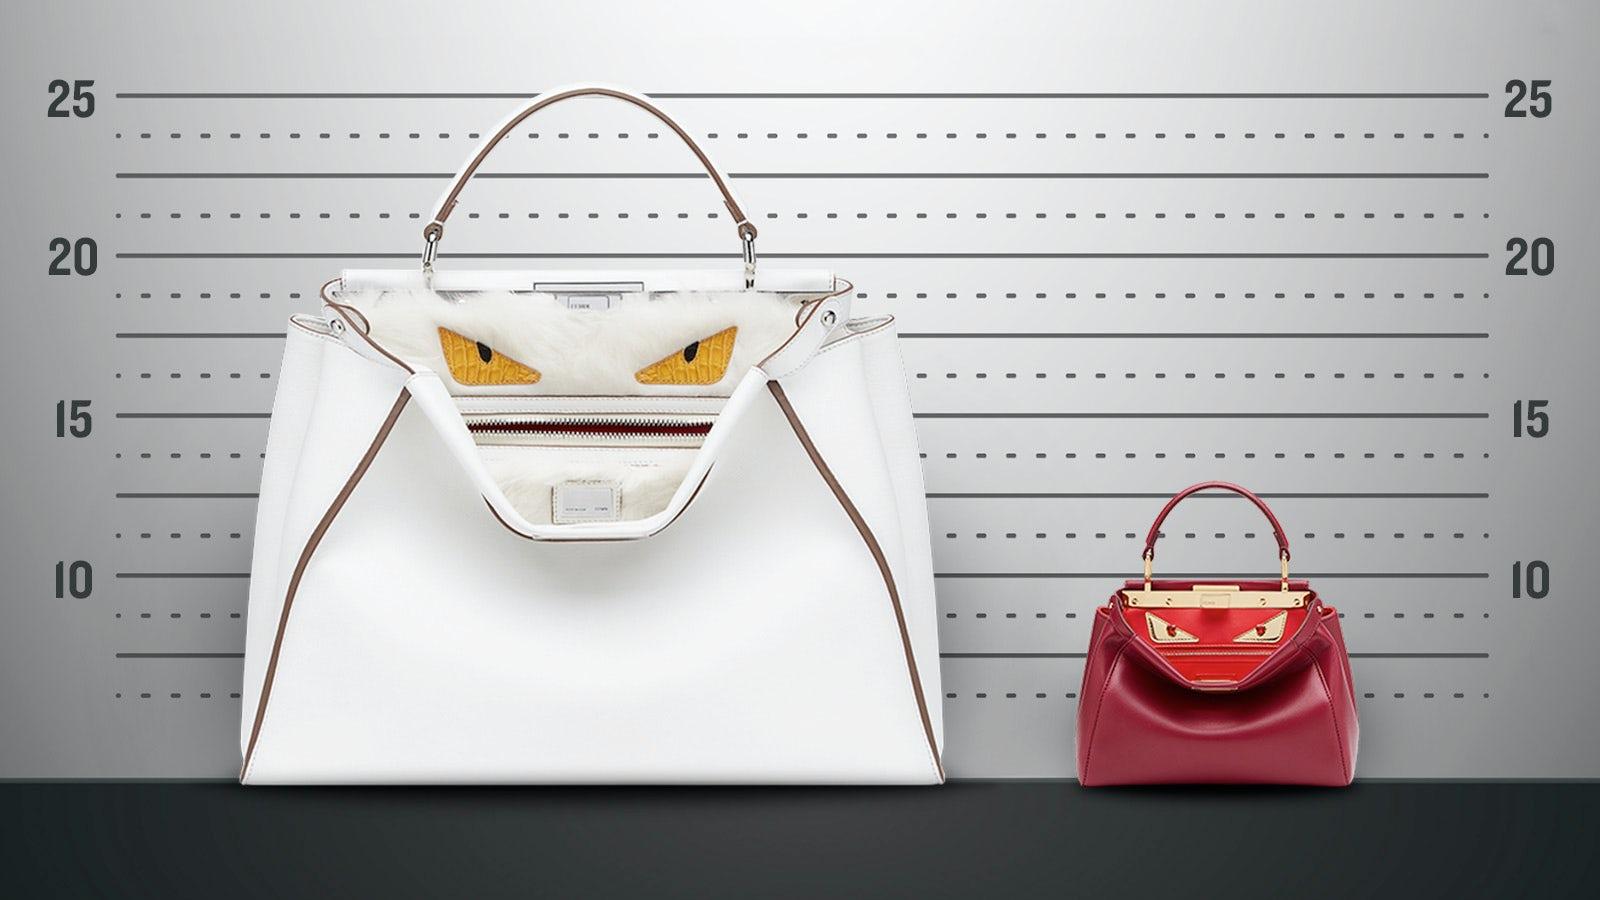 Fendi's Peekaboo handbag in 'large' and 'mini' | Photo: Paul Price for BoF